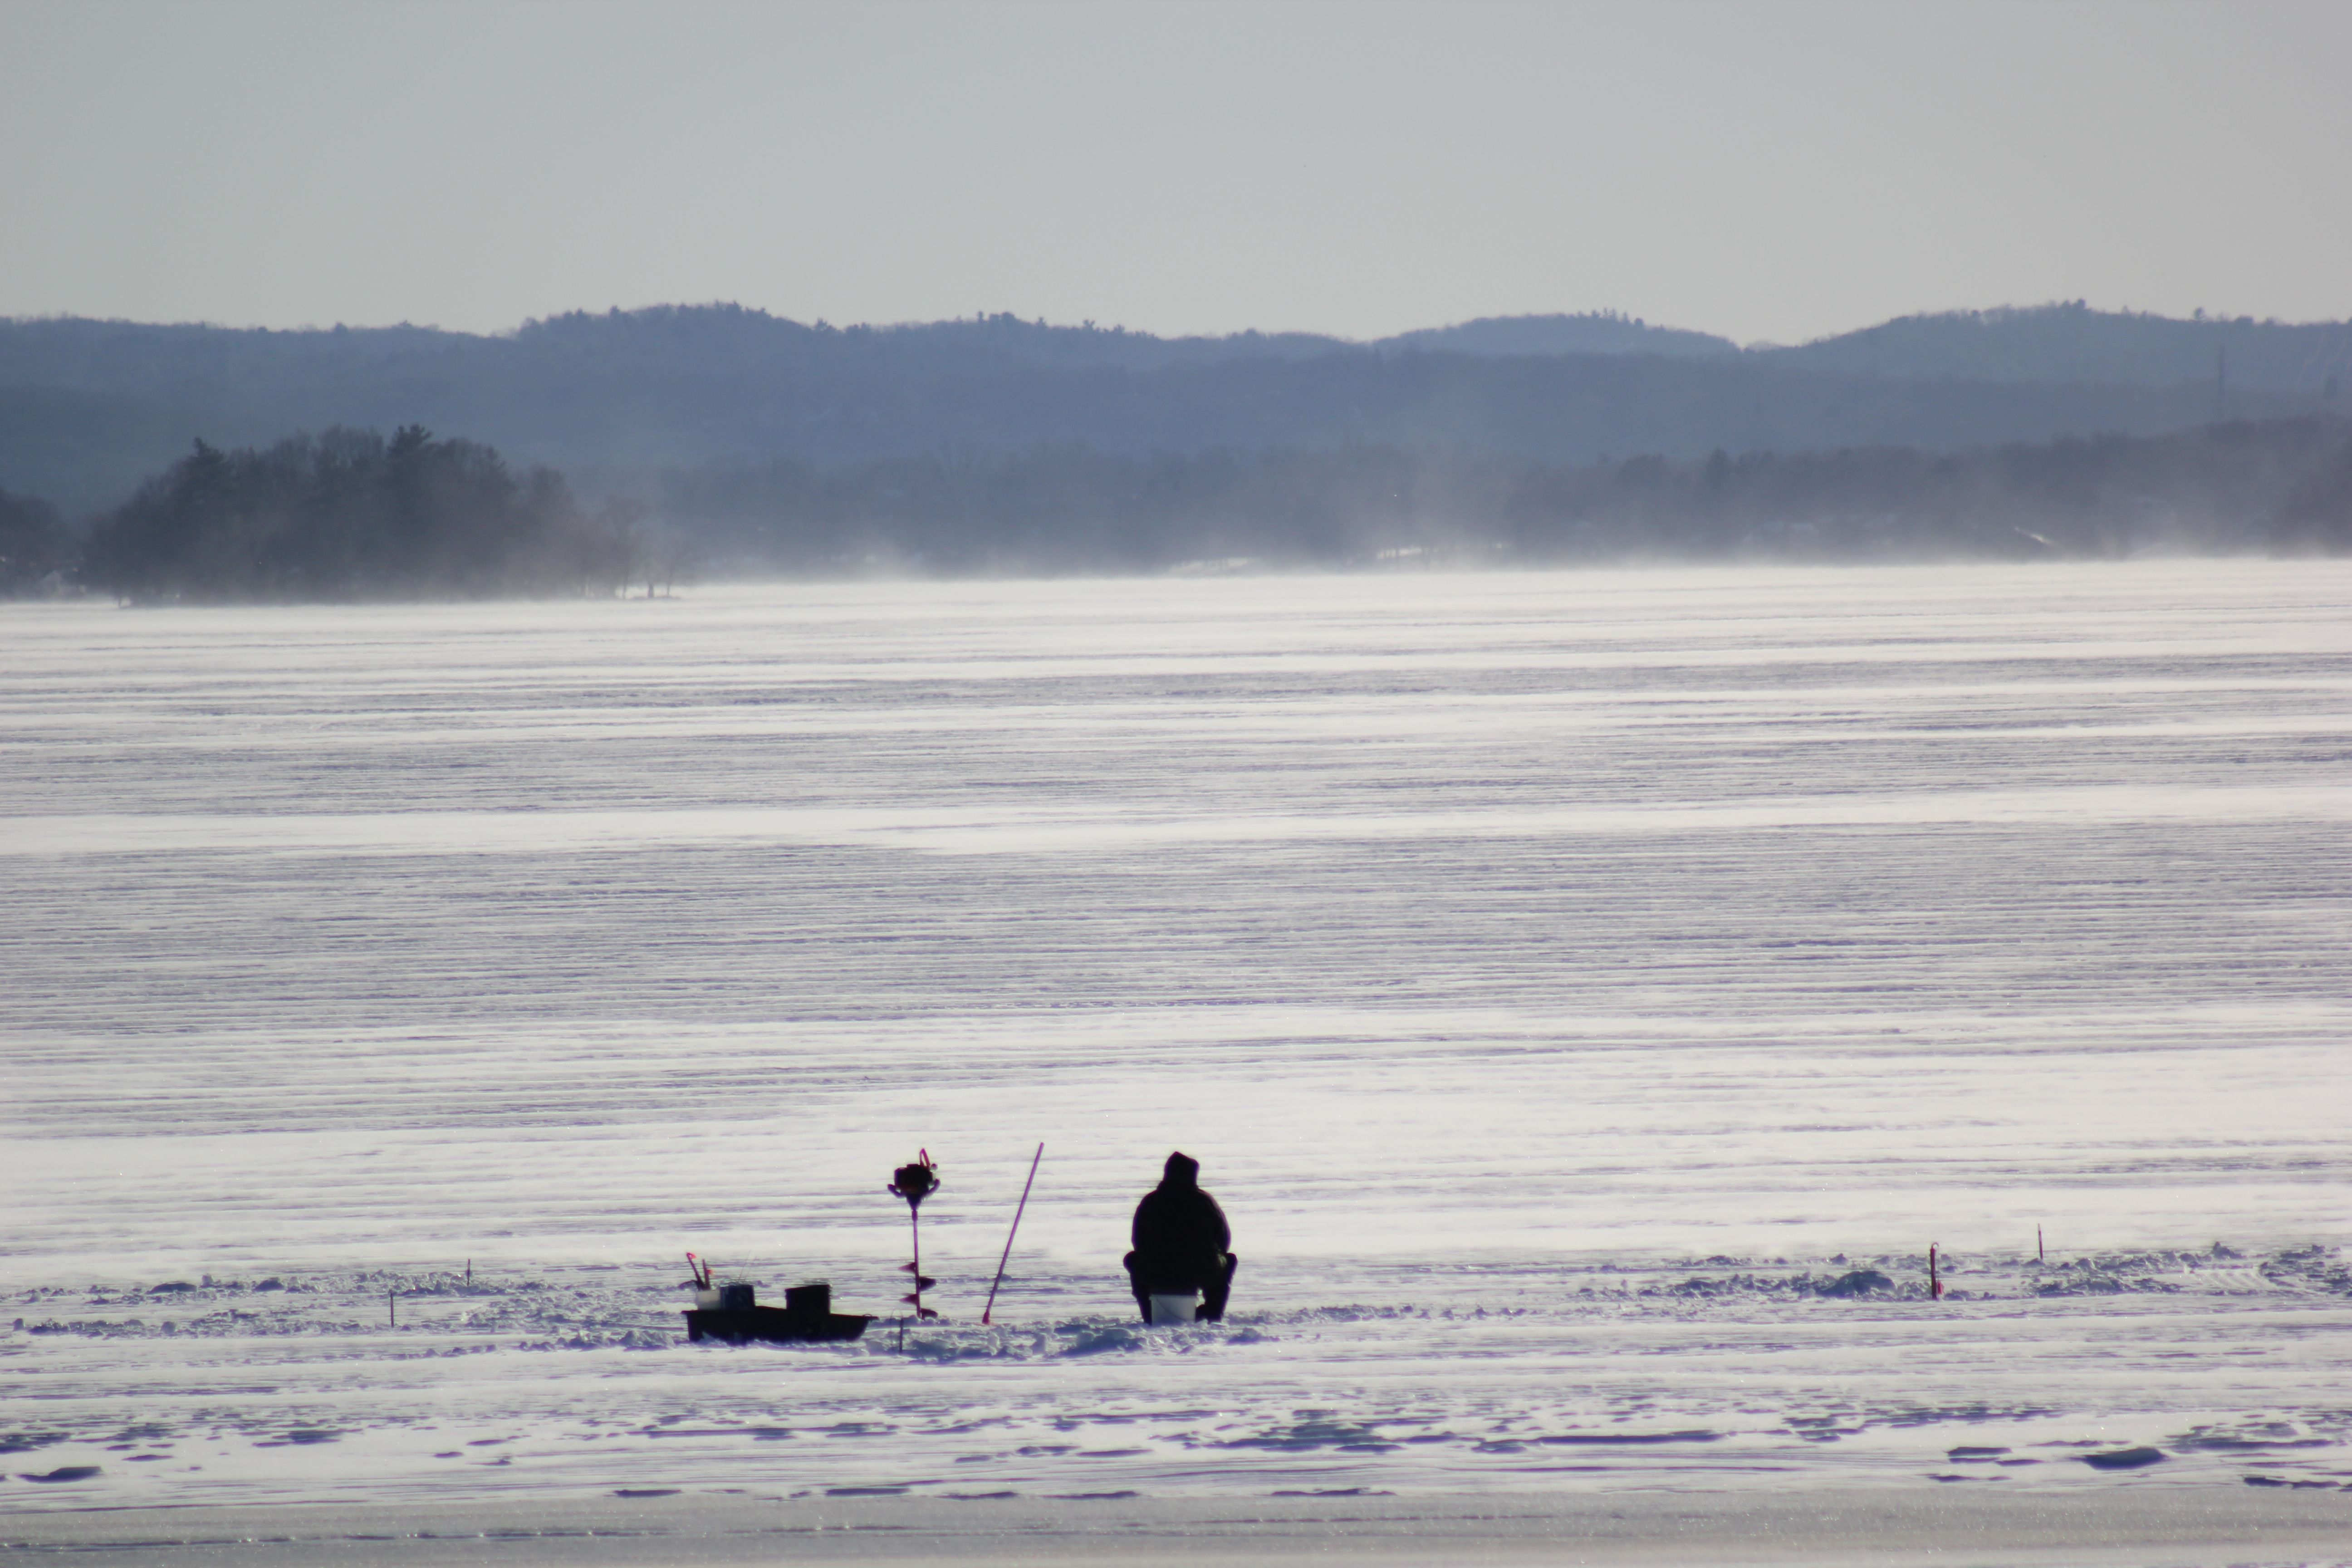 Ice fishing on greenwood lake ny winter at the lake for Ice fishing ny